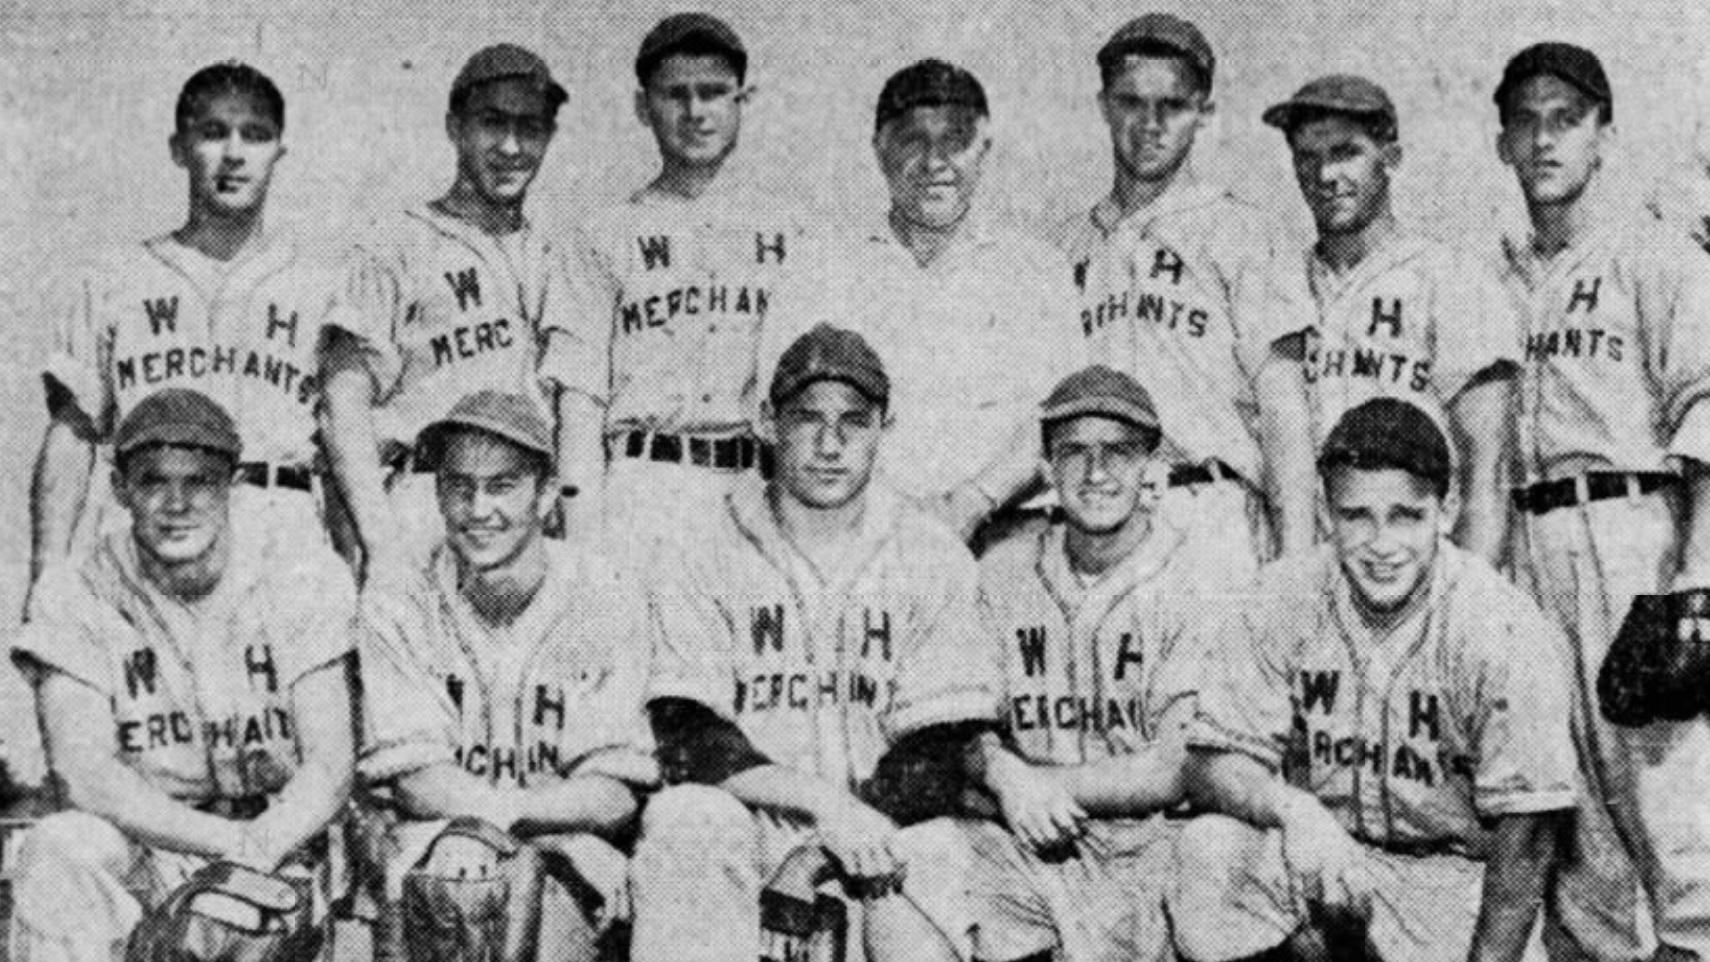 1949 West Hartford Merchants.jpg